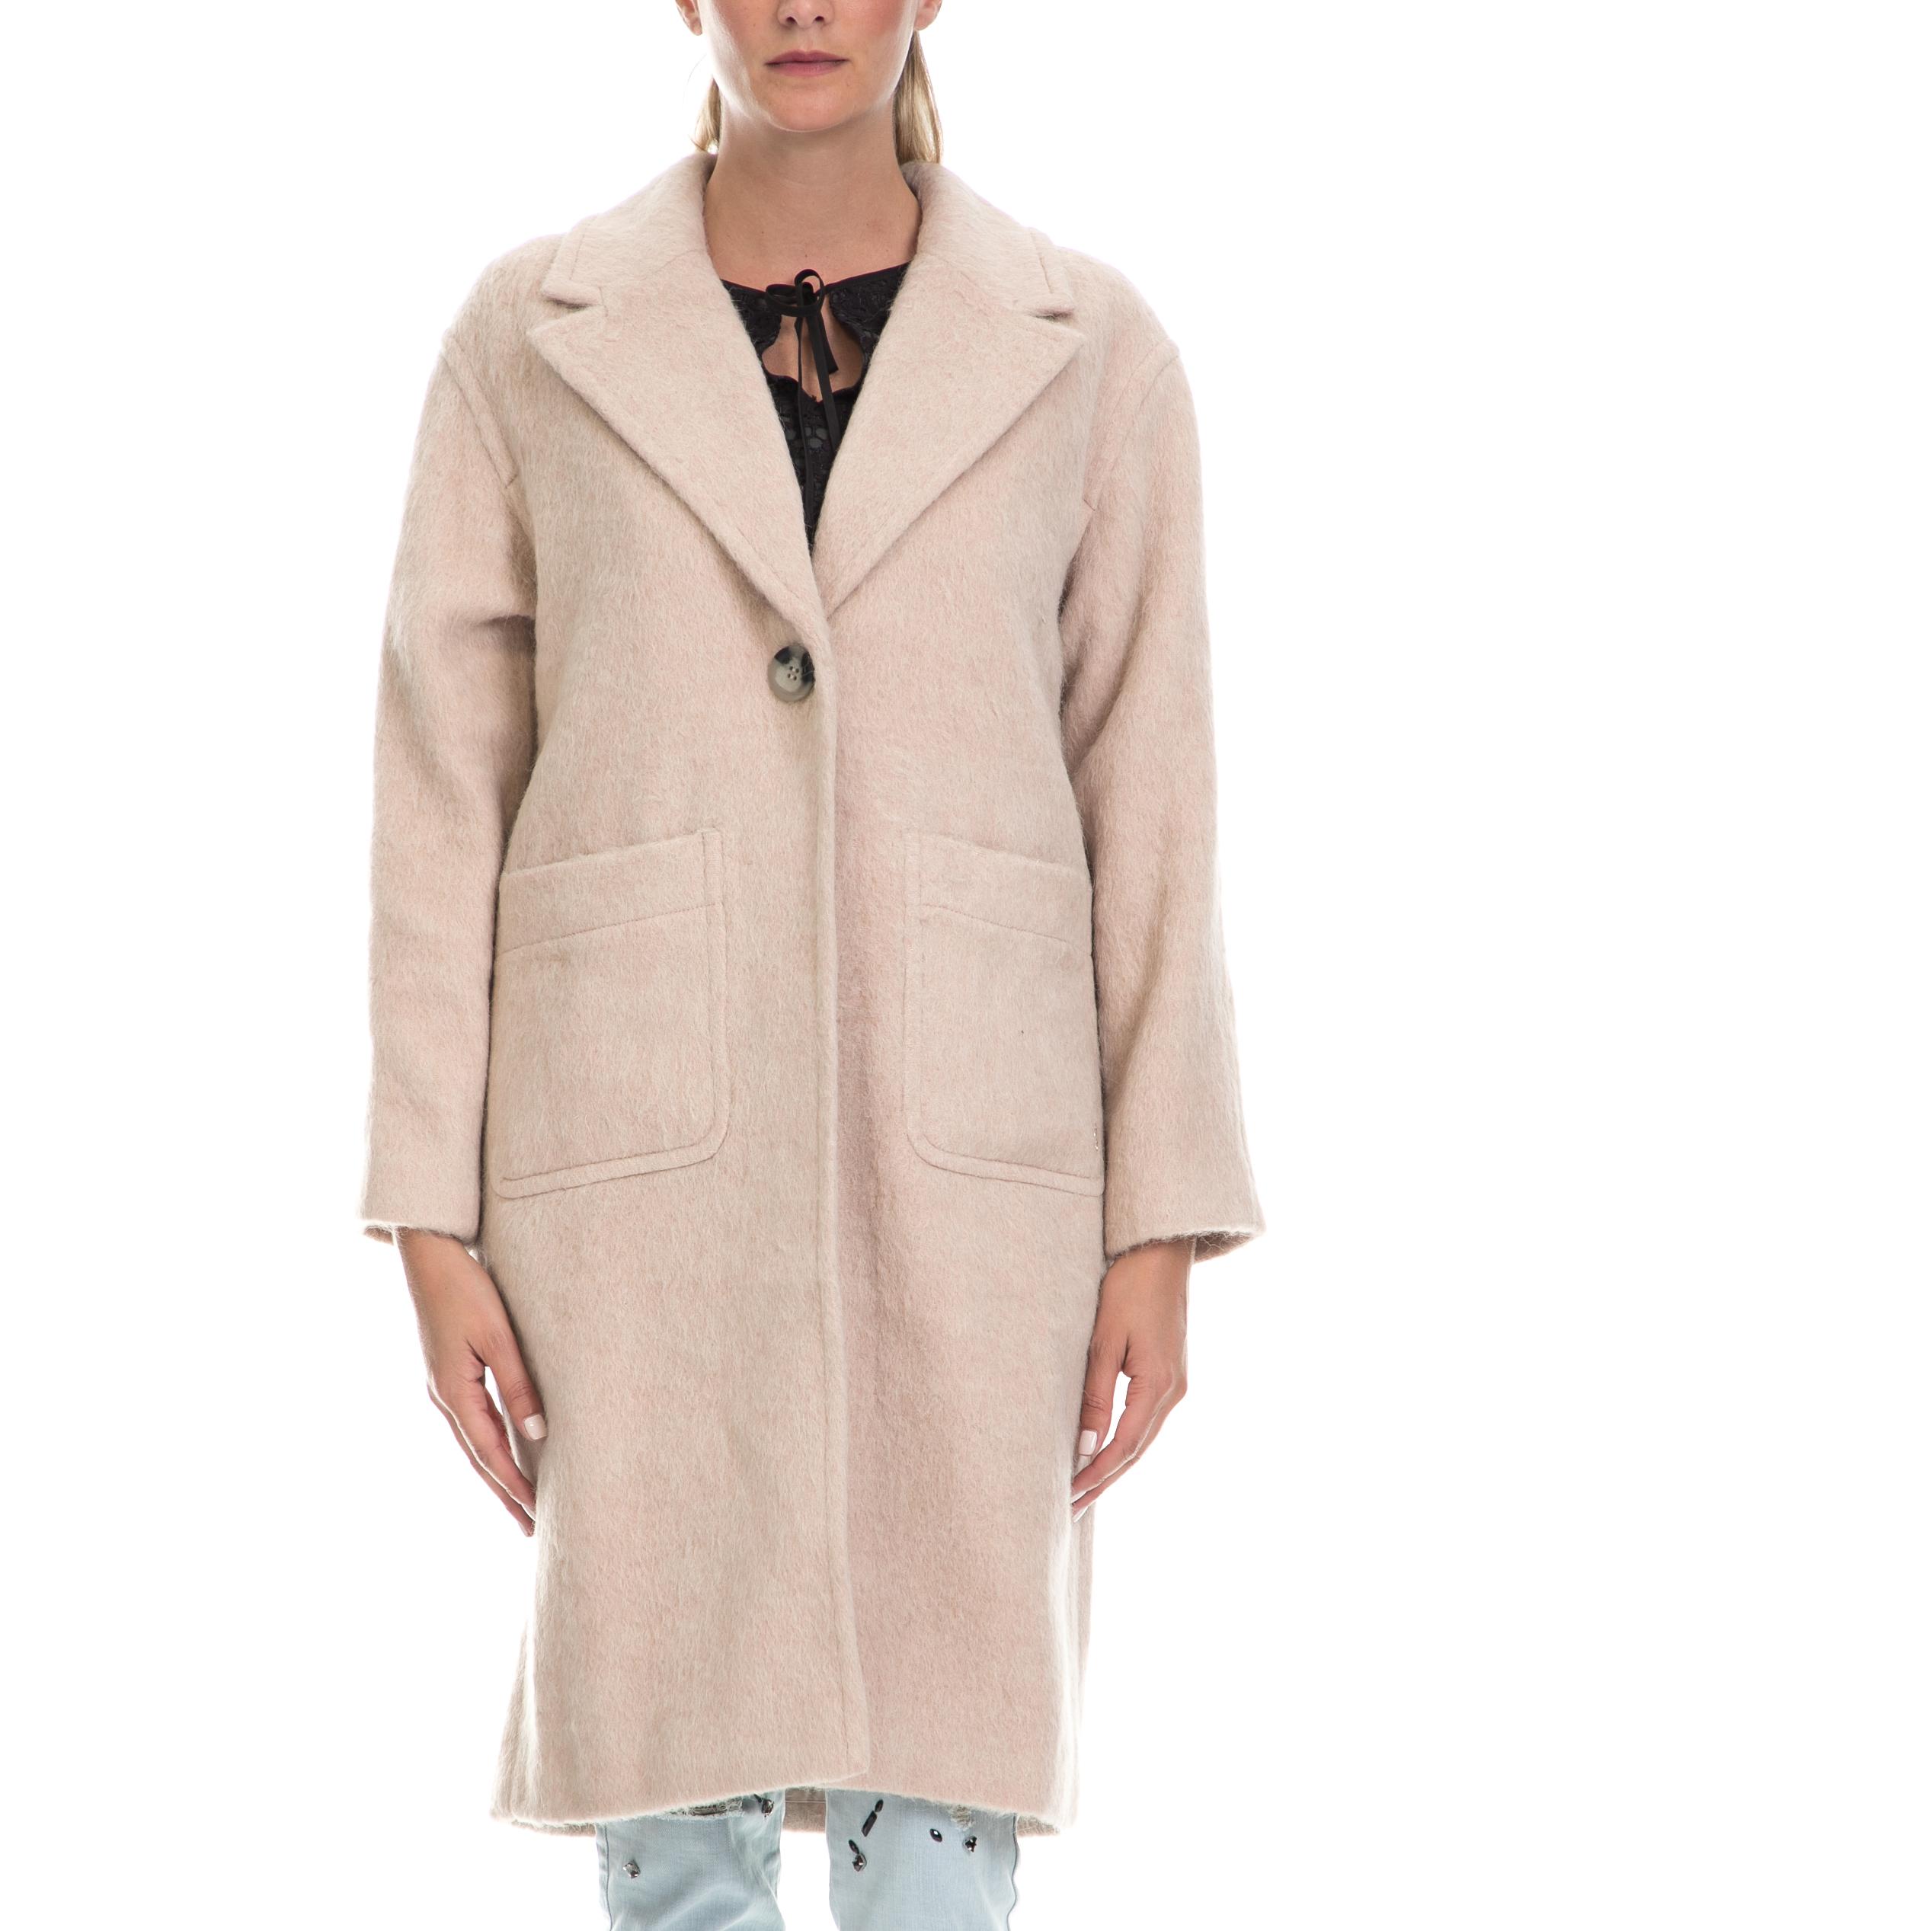 JUICY COUTURE - Γυναικείο παλτό BRUSHED WOOL COAT μπεζ γυναικεία ρούχα πανωφόρια παλτό